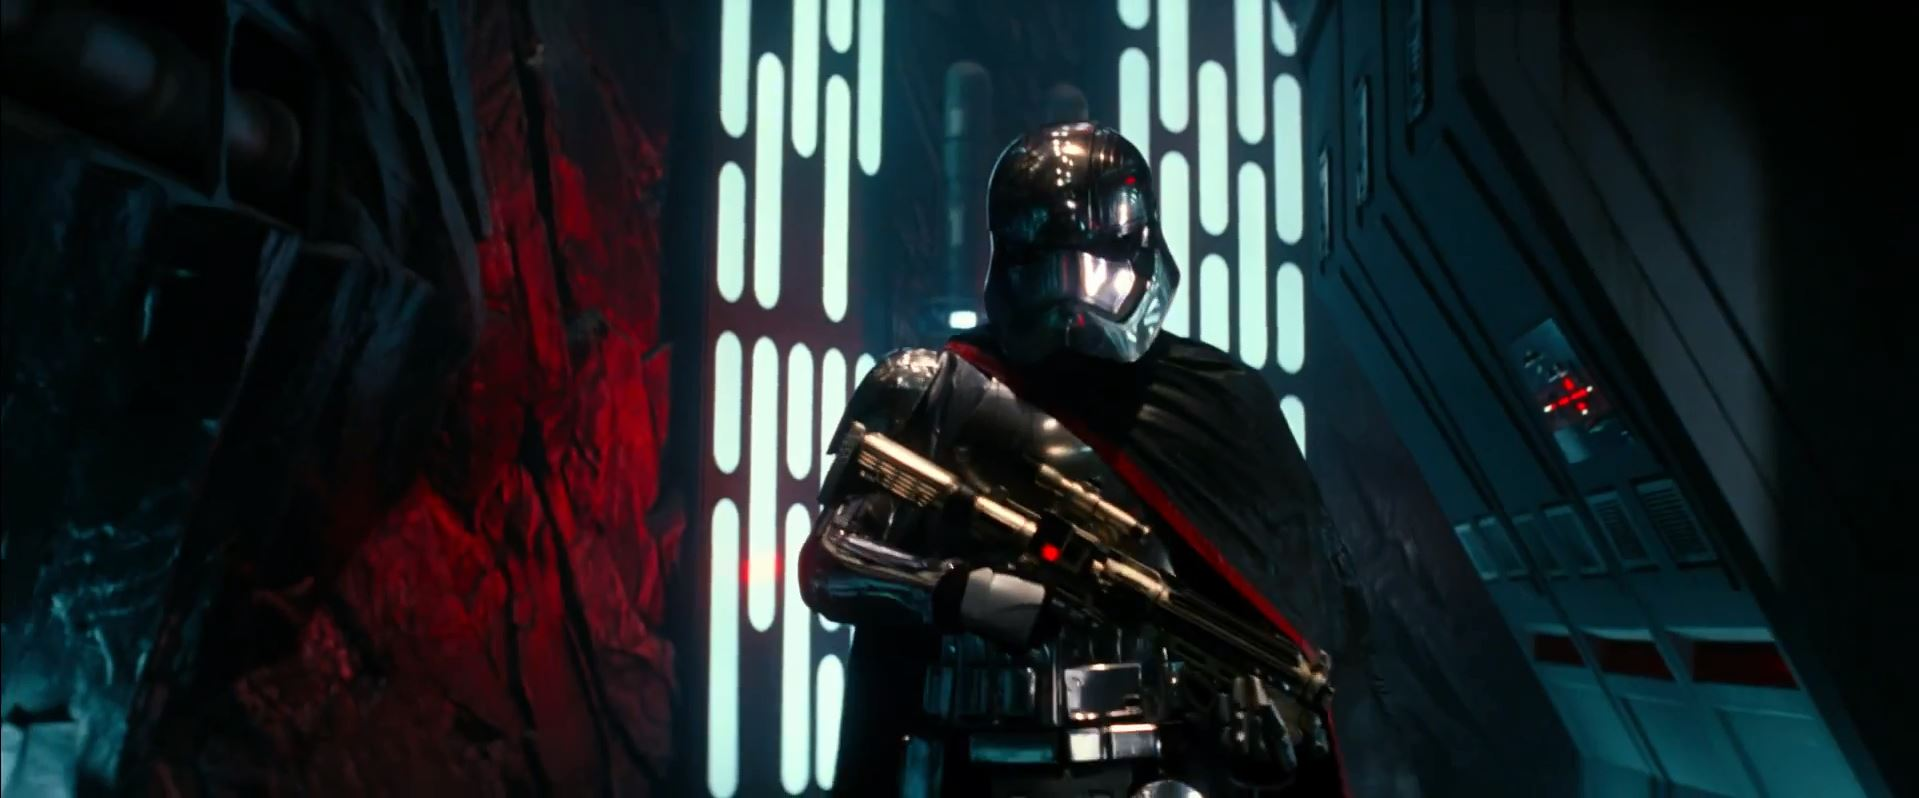 Gwendoline Christie as a super trooper